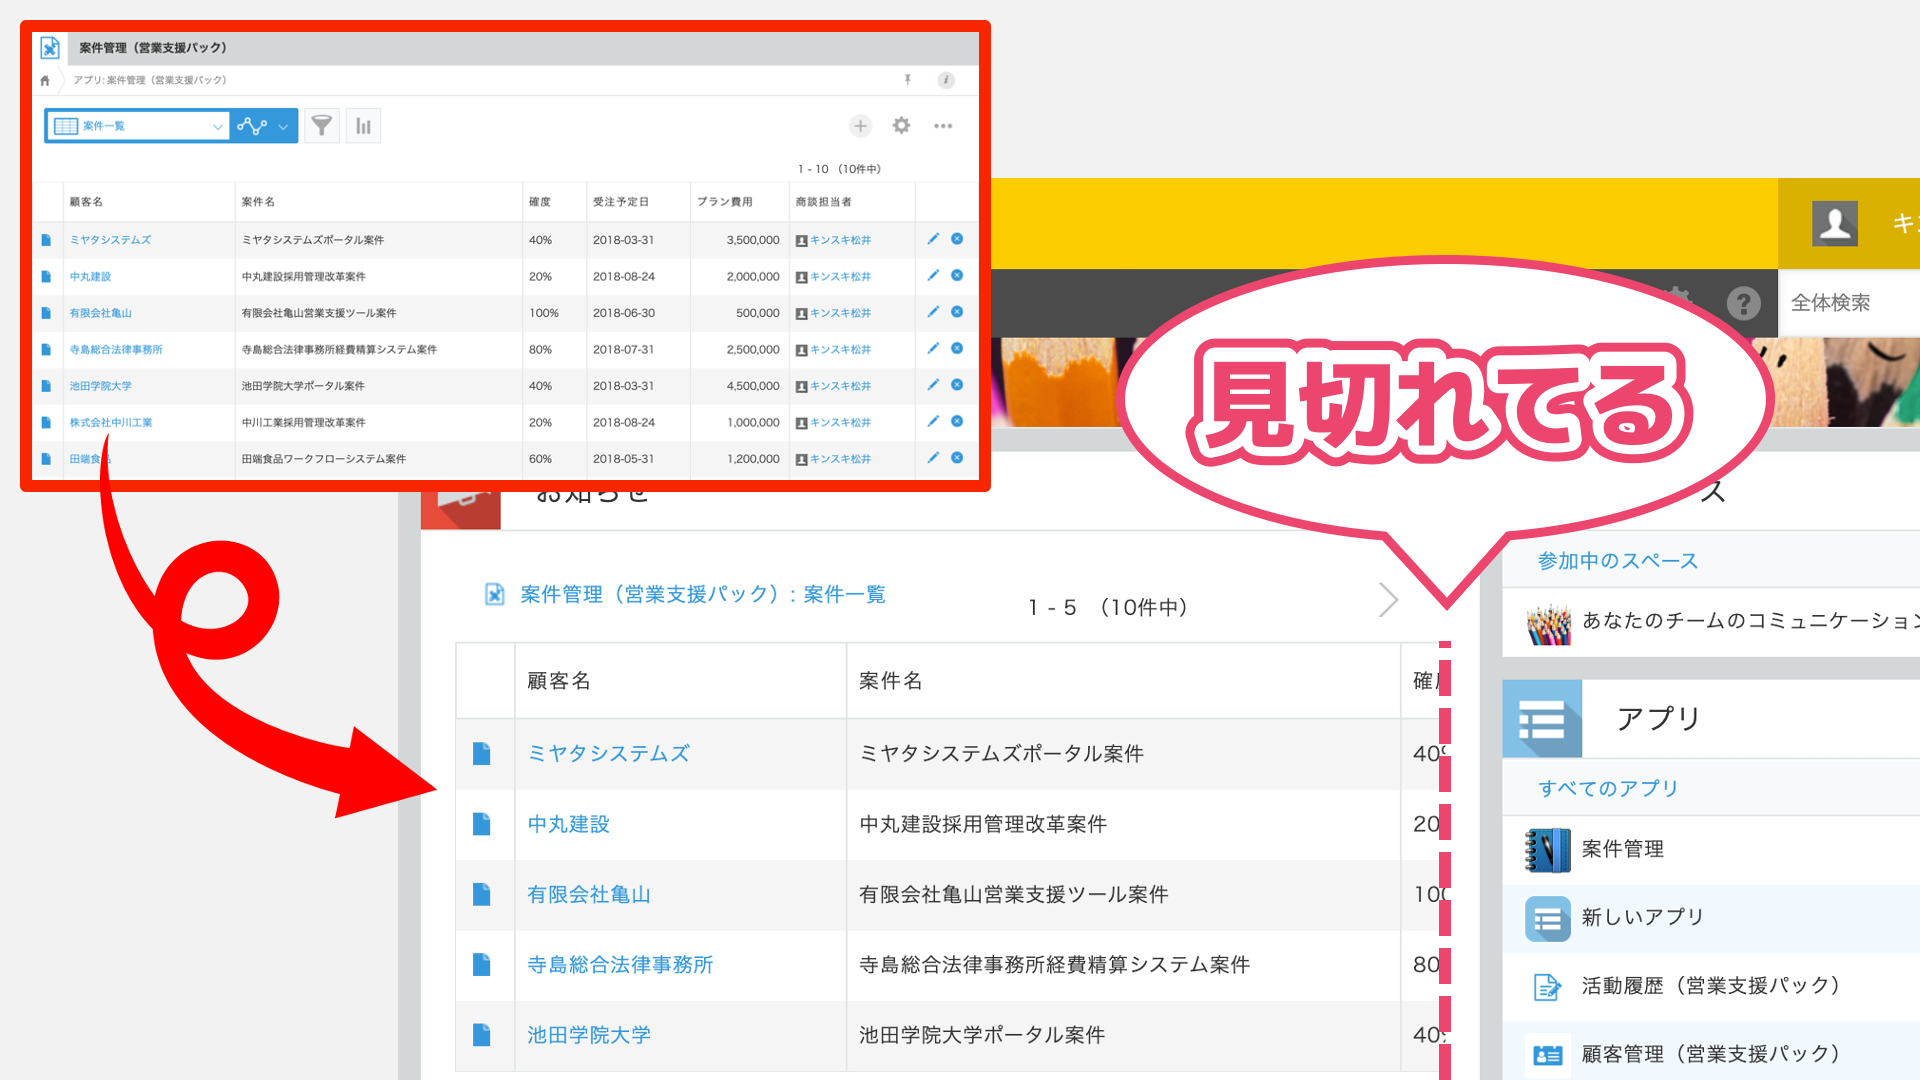 https://kintone-blog.cybozu.co.jp/%E3%83%95%E3%82%9A%E3%83%AC%E3%82%BB%E3%82%99%E3%83%B3%E3%83%86%E3%83%BC%E3%82%B7%E3%83%A7%E3%83%B31%203.png